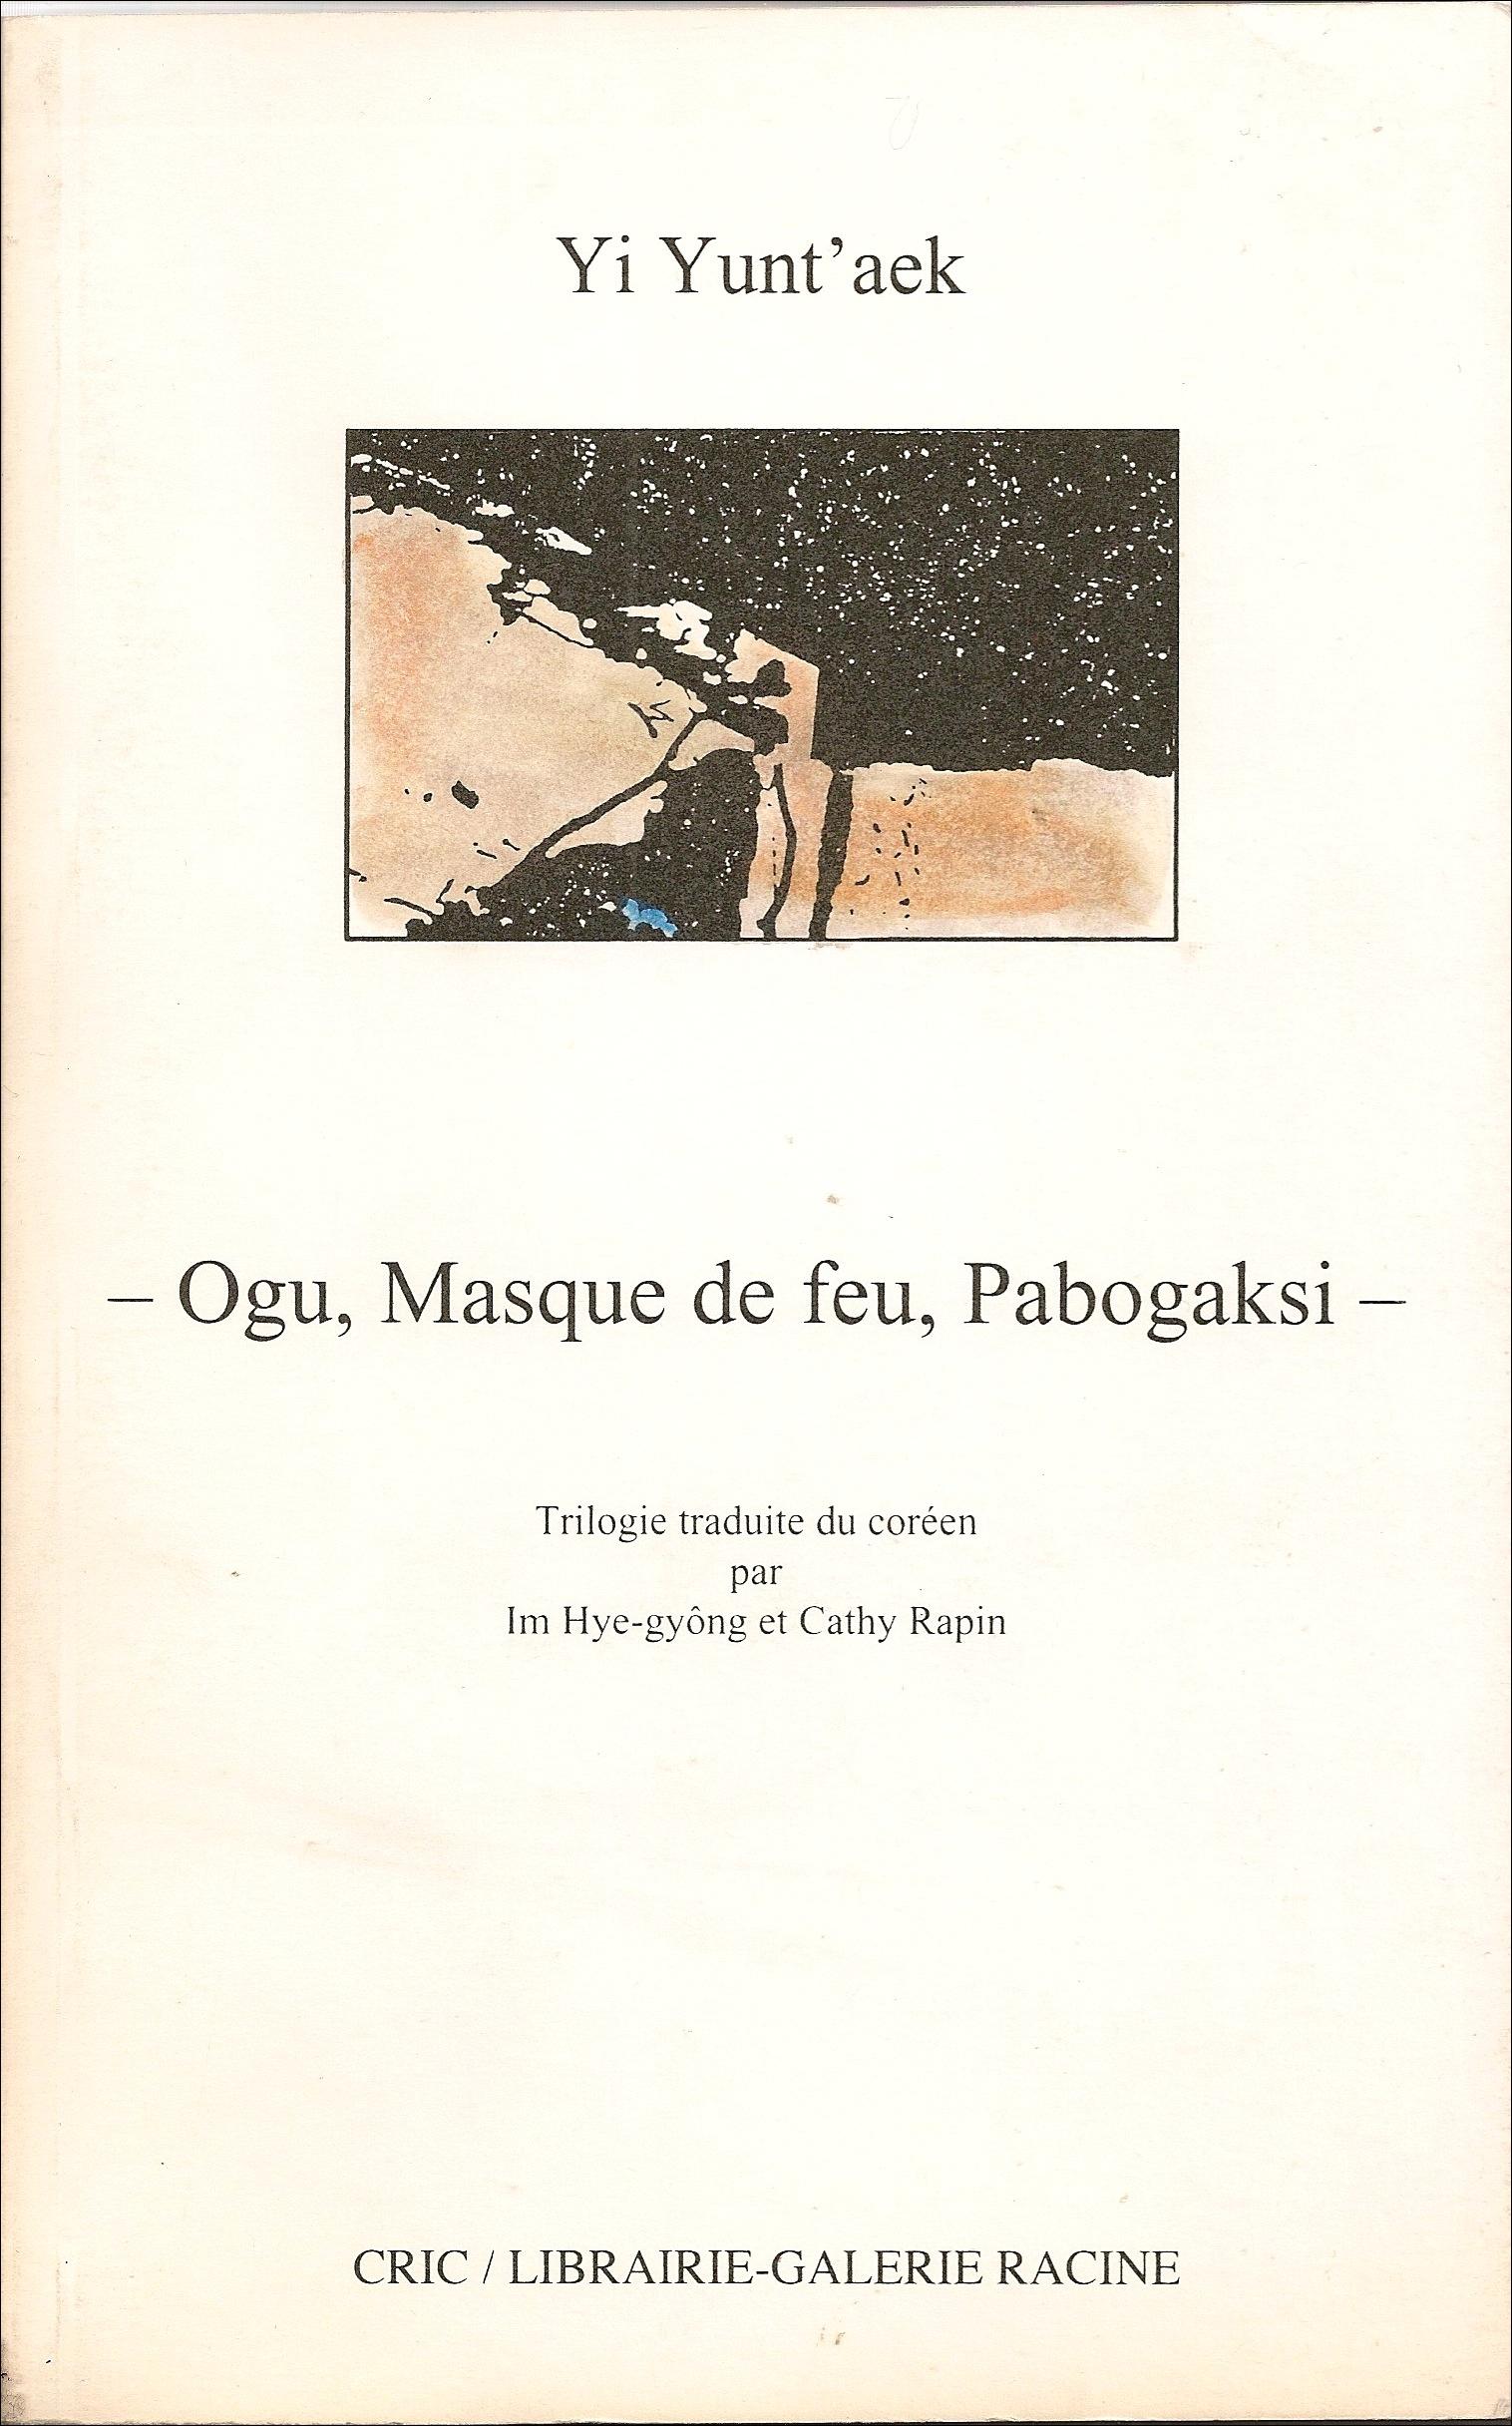 6- Yi Yunt'aek - Ogu, Masque de feu, Pabogaksi